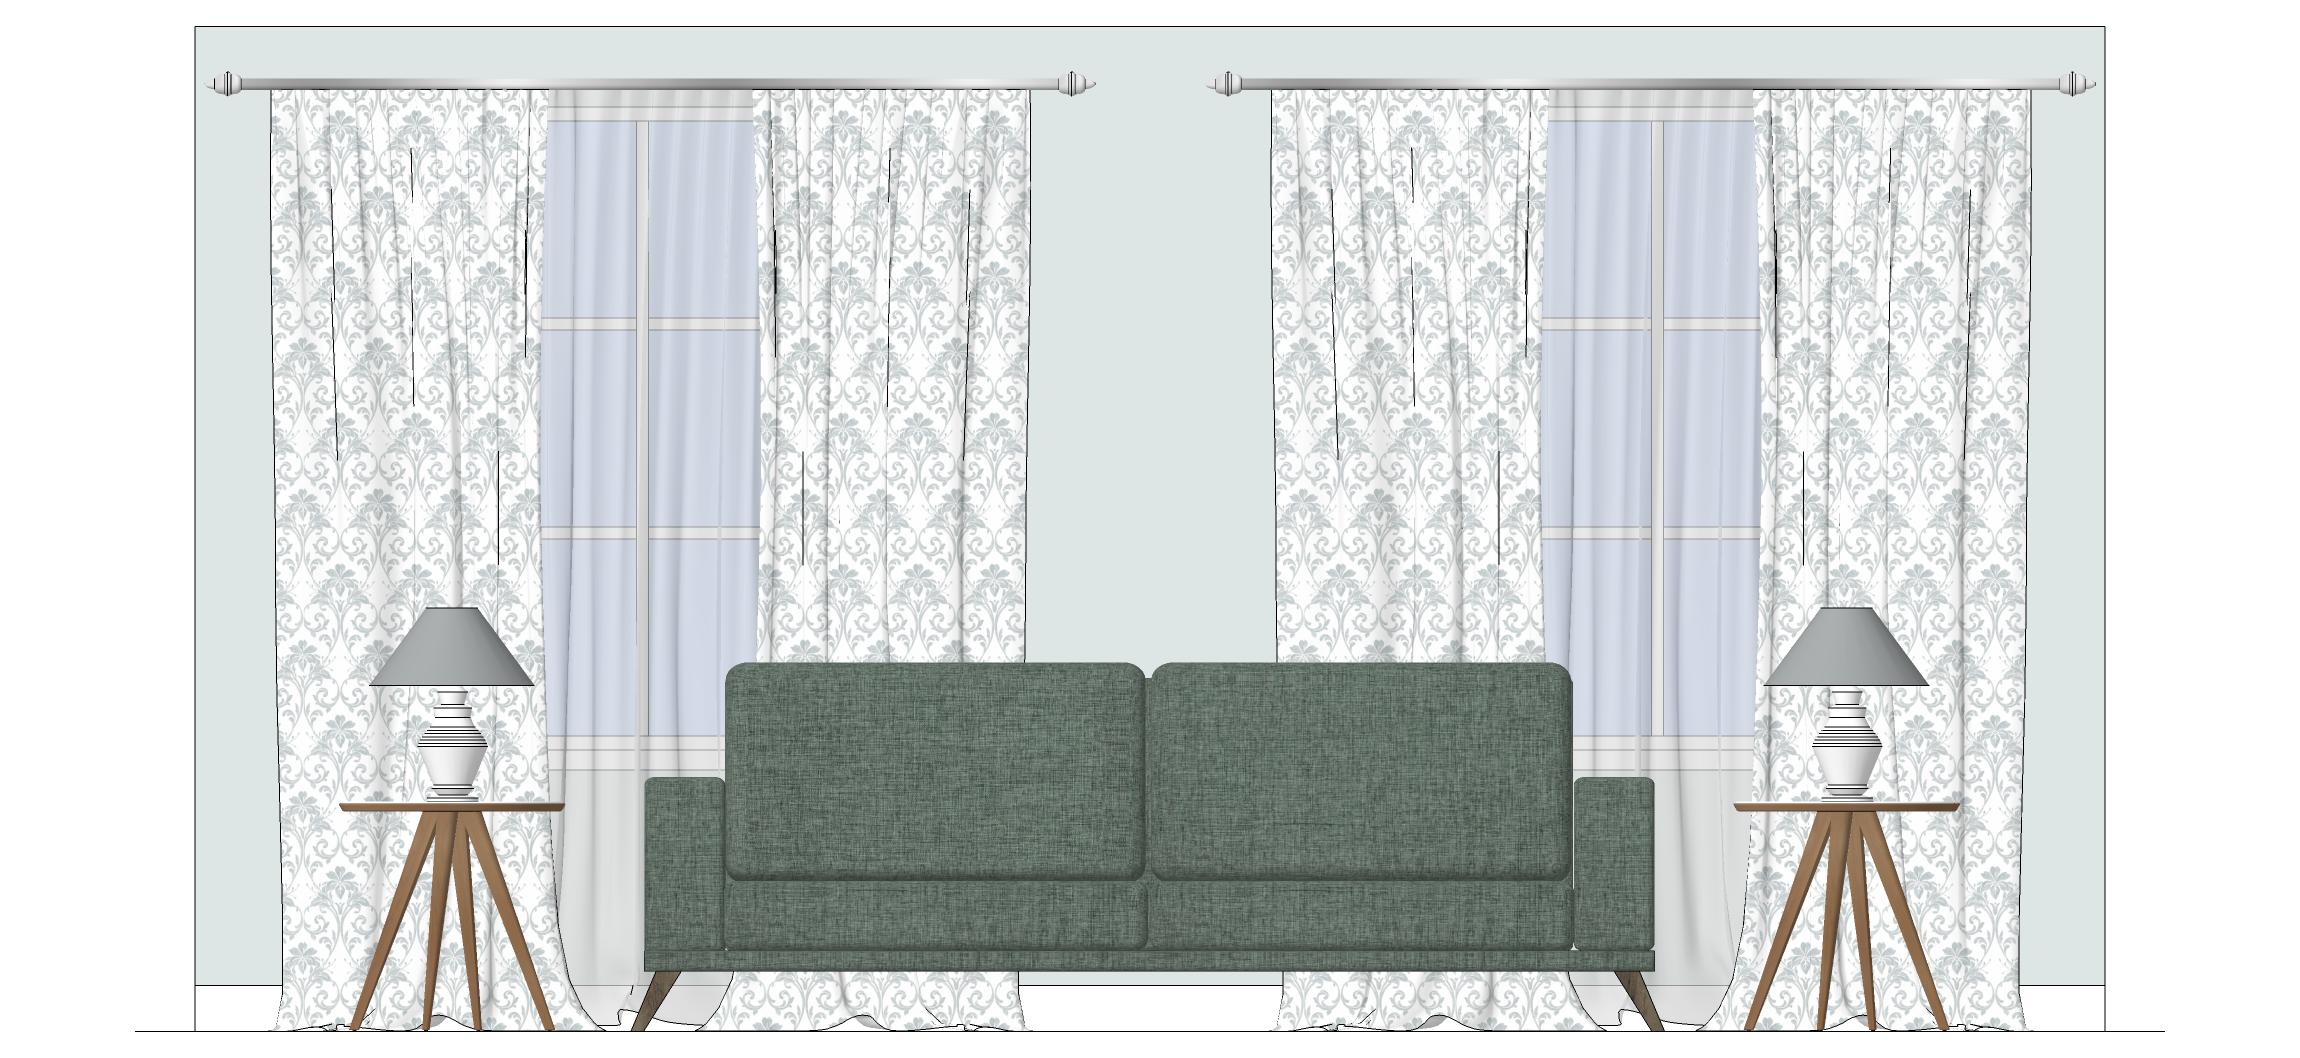 Elevation Plan Sketchup : Rendered sketchup floor plan and elevation before